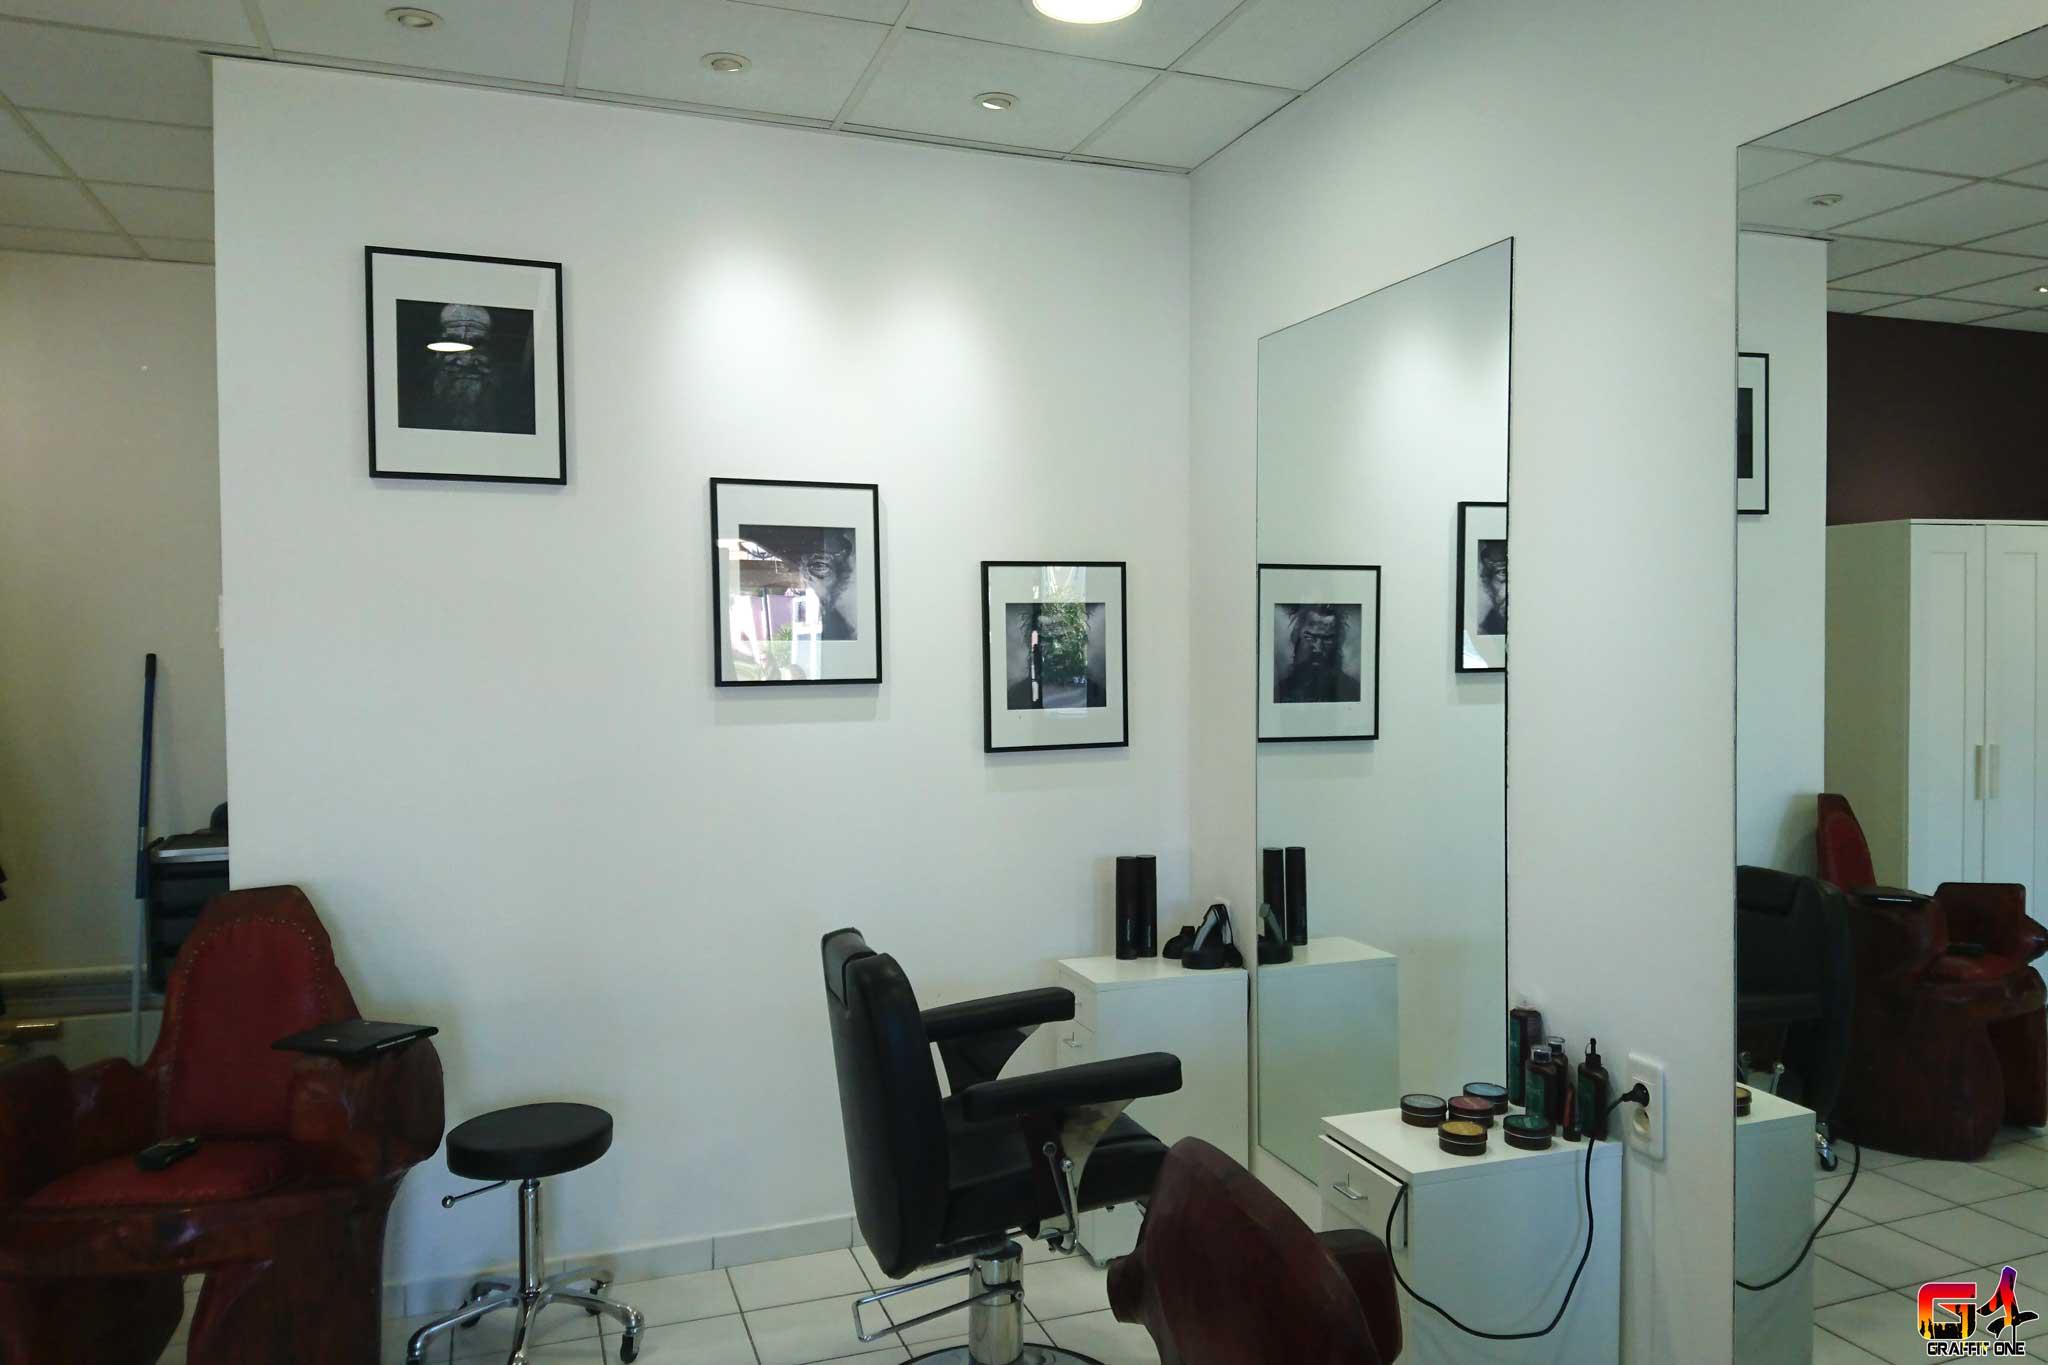 Graffiti salon de coiffure lattes art s r nissime barber for Salon art contemporain montpellier